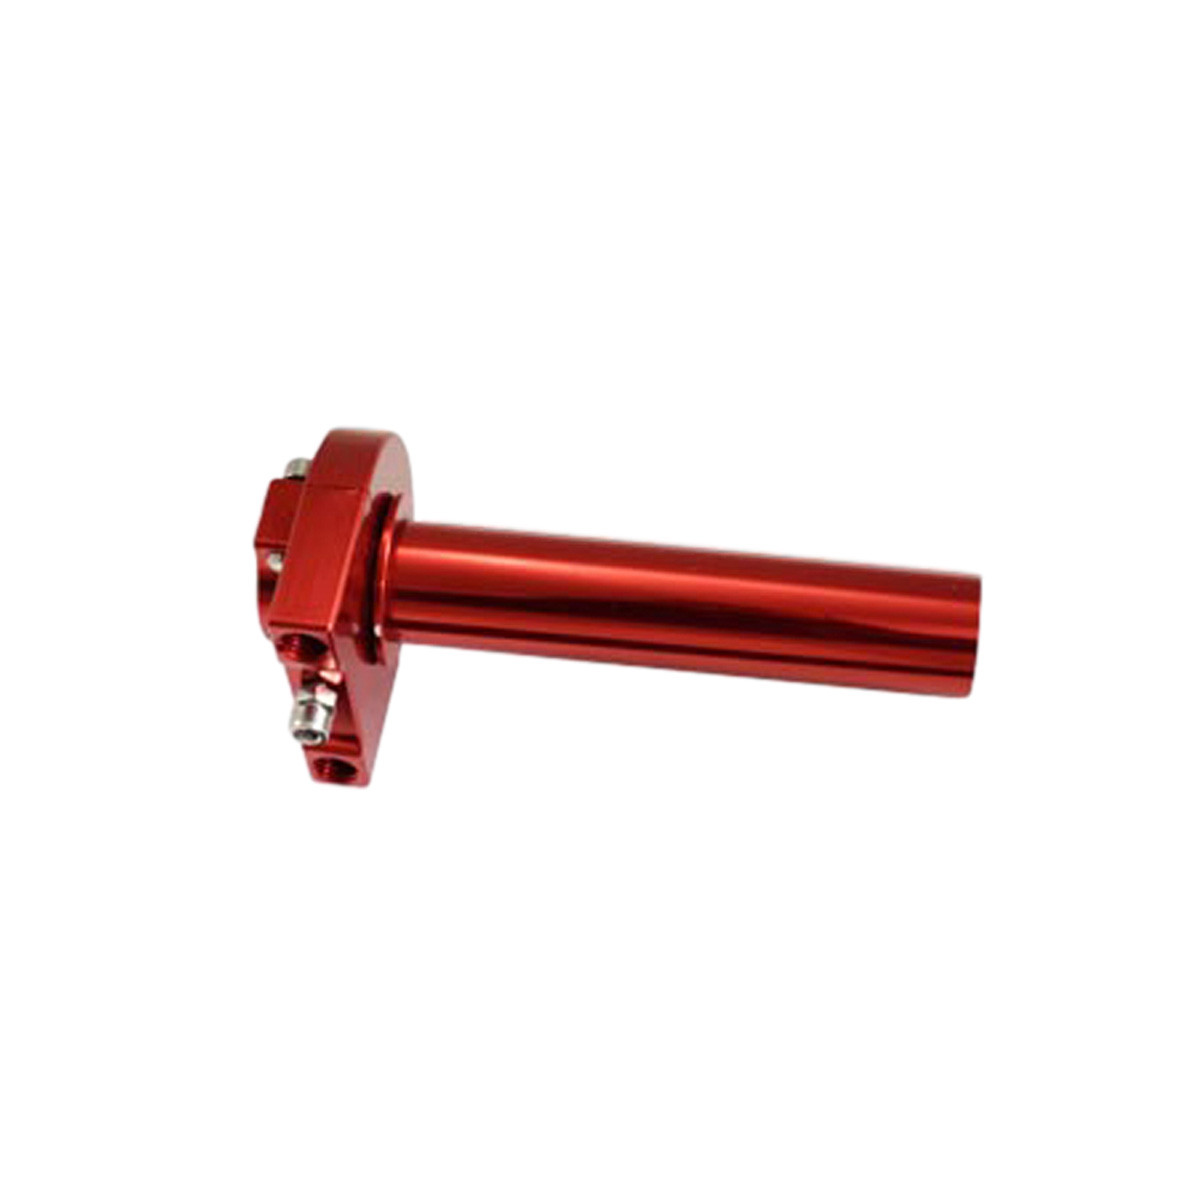 Poignée Gaz Tirage rapide Alu CNC - TUN'R Rouge